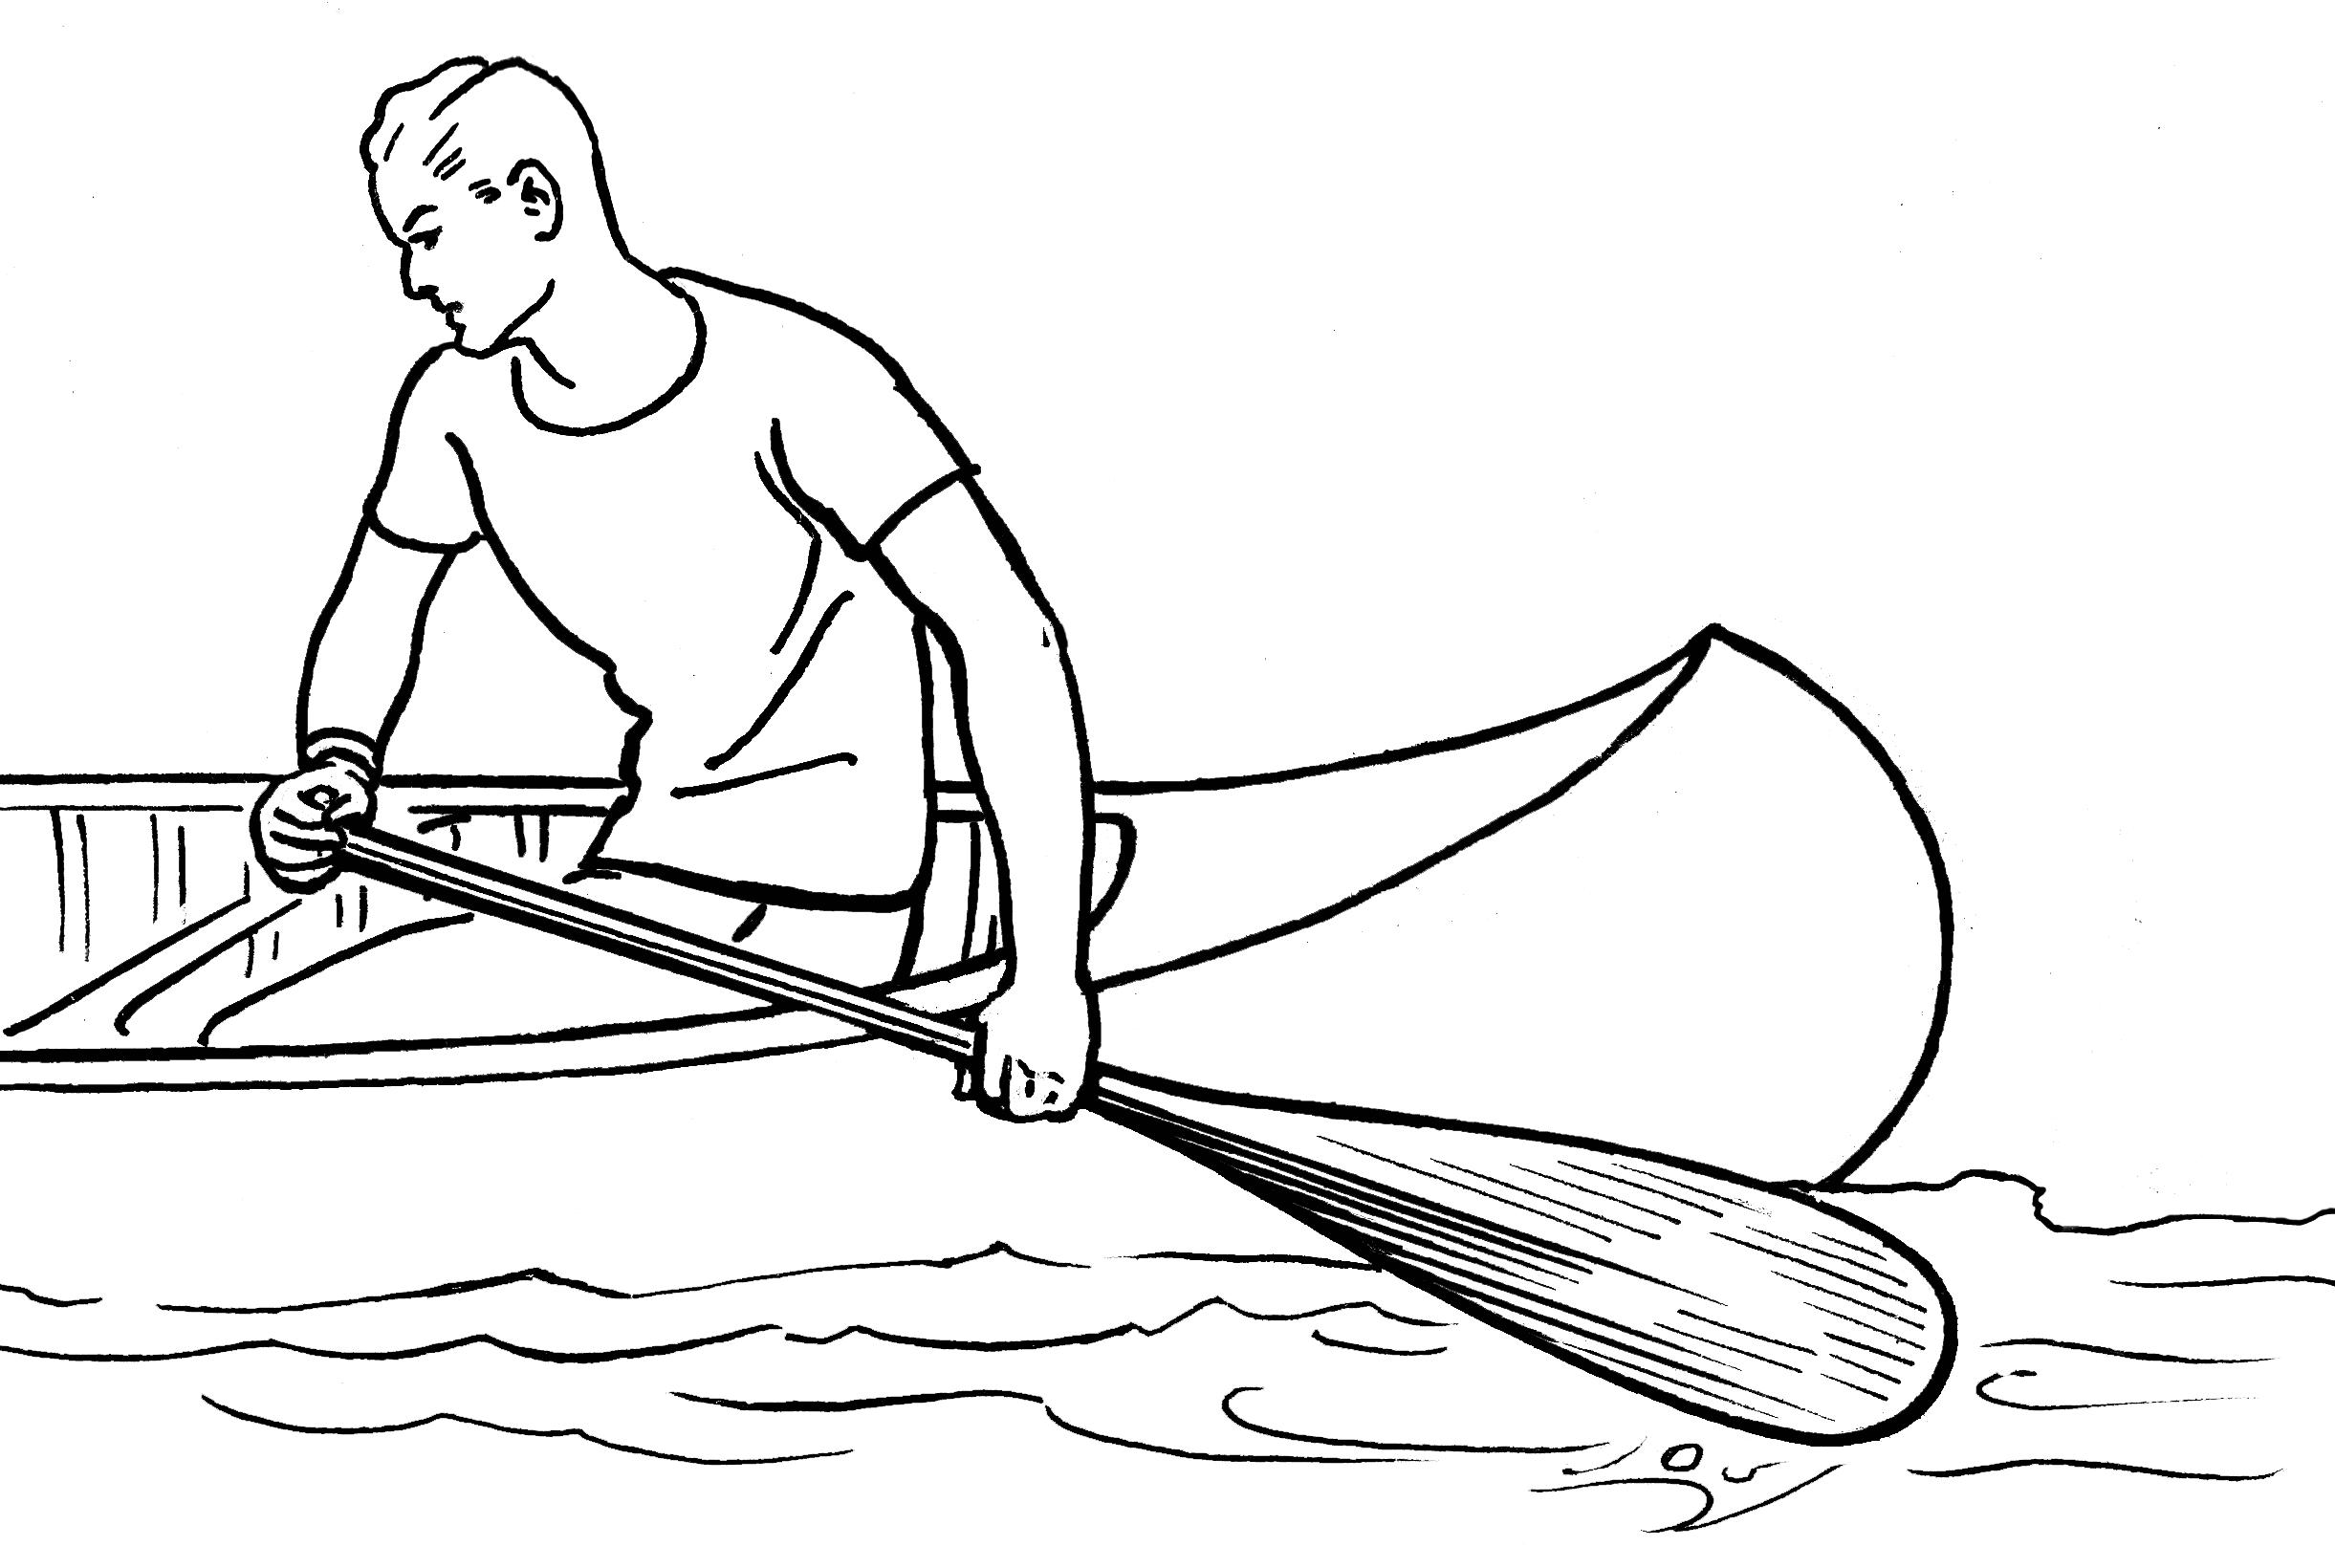 Paddleboat Stock Images RoyaltyFree Images amp Vectors